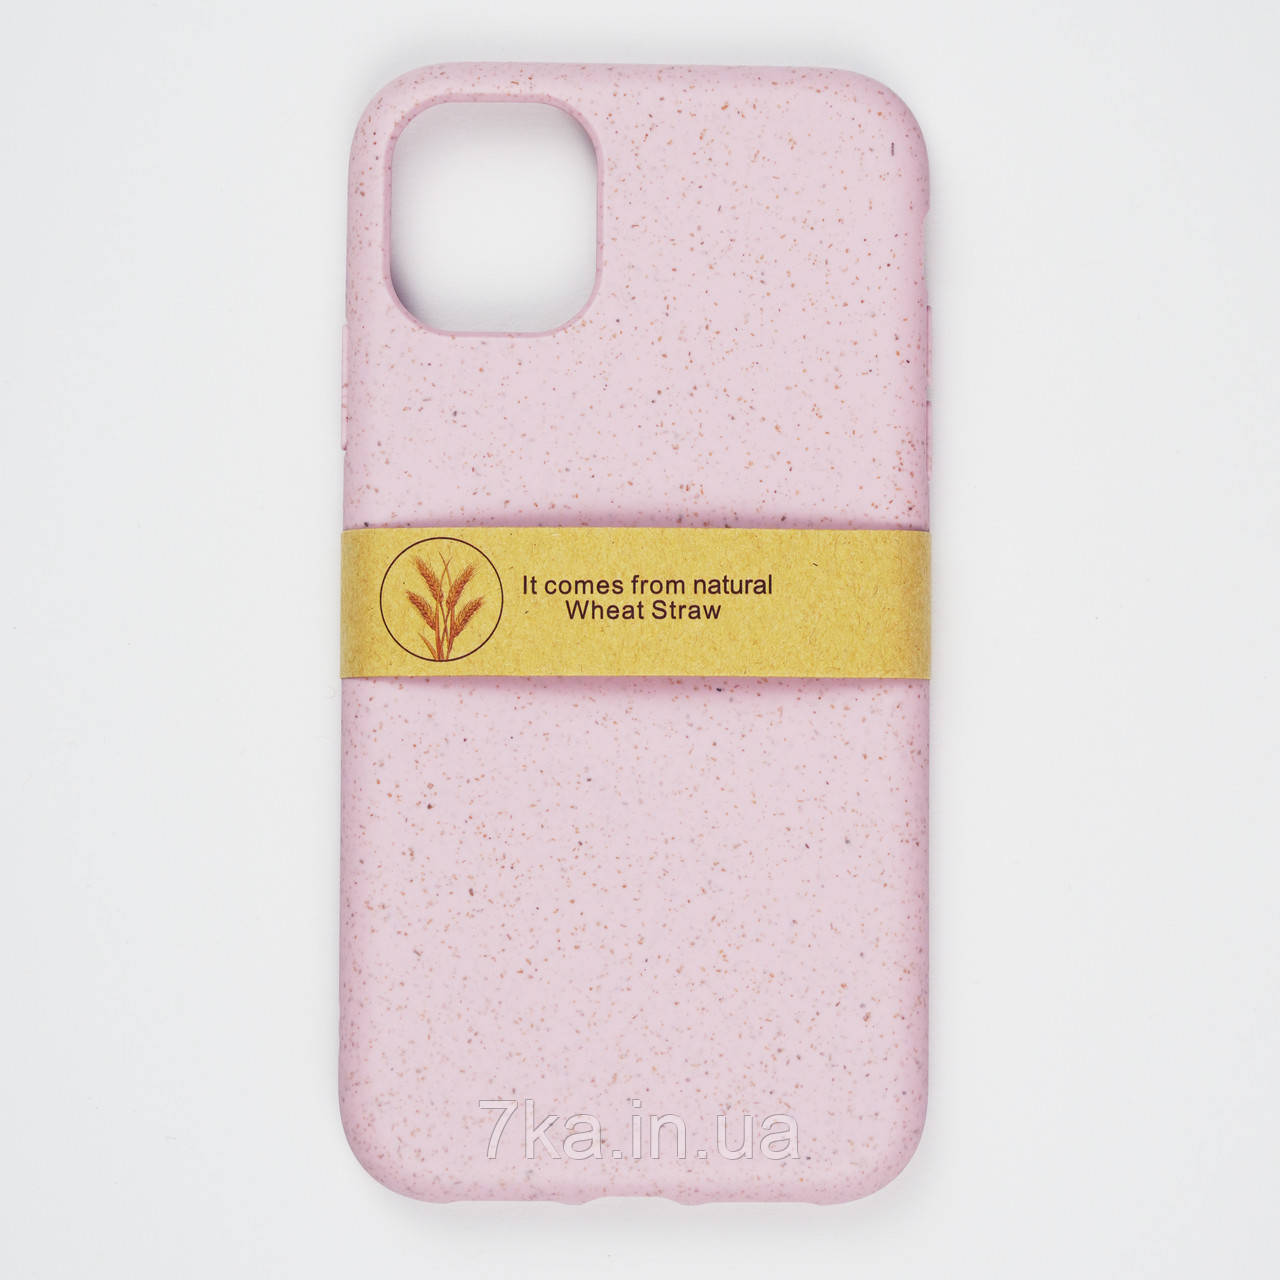 Биоразлагаемый чехол ECO Wheat Straw для iPhone 11 Pink